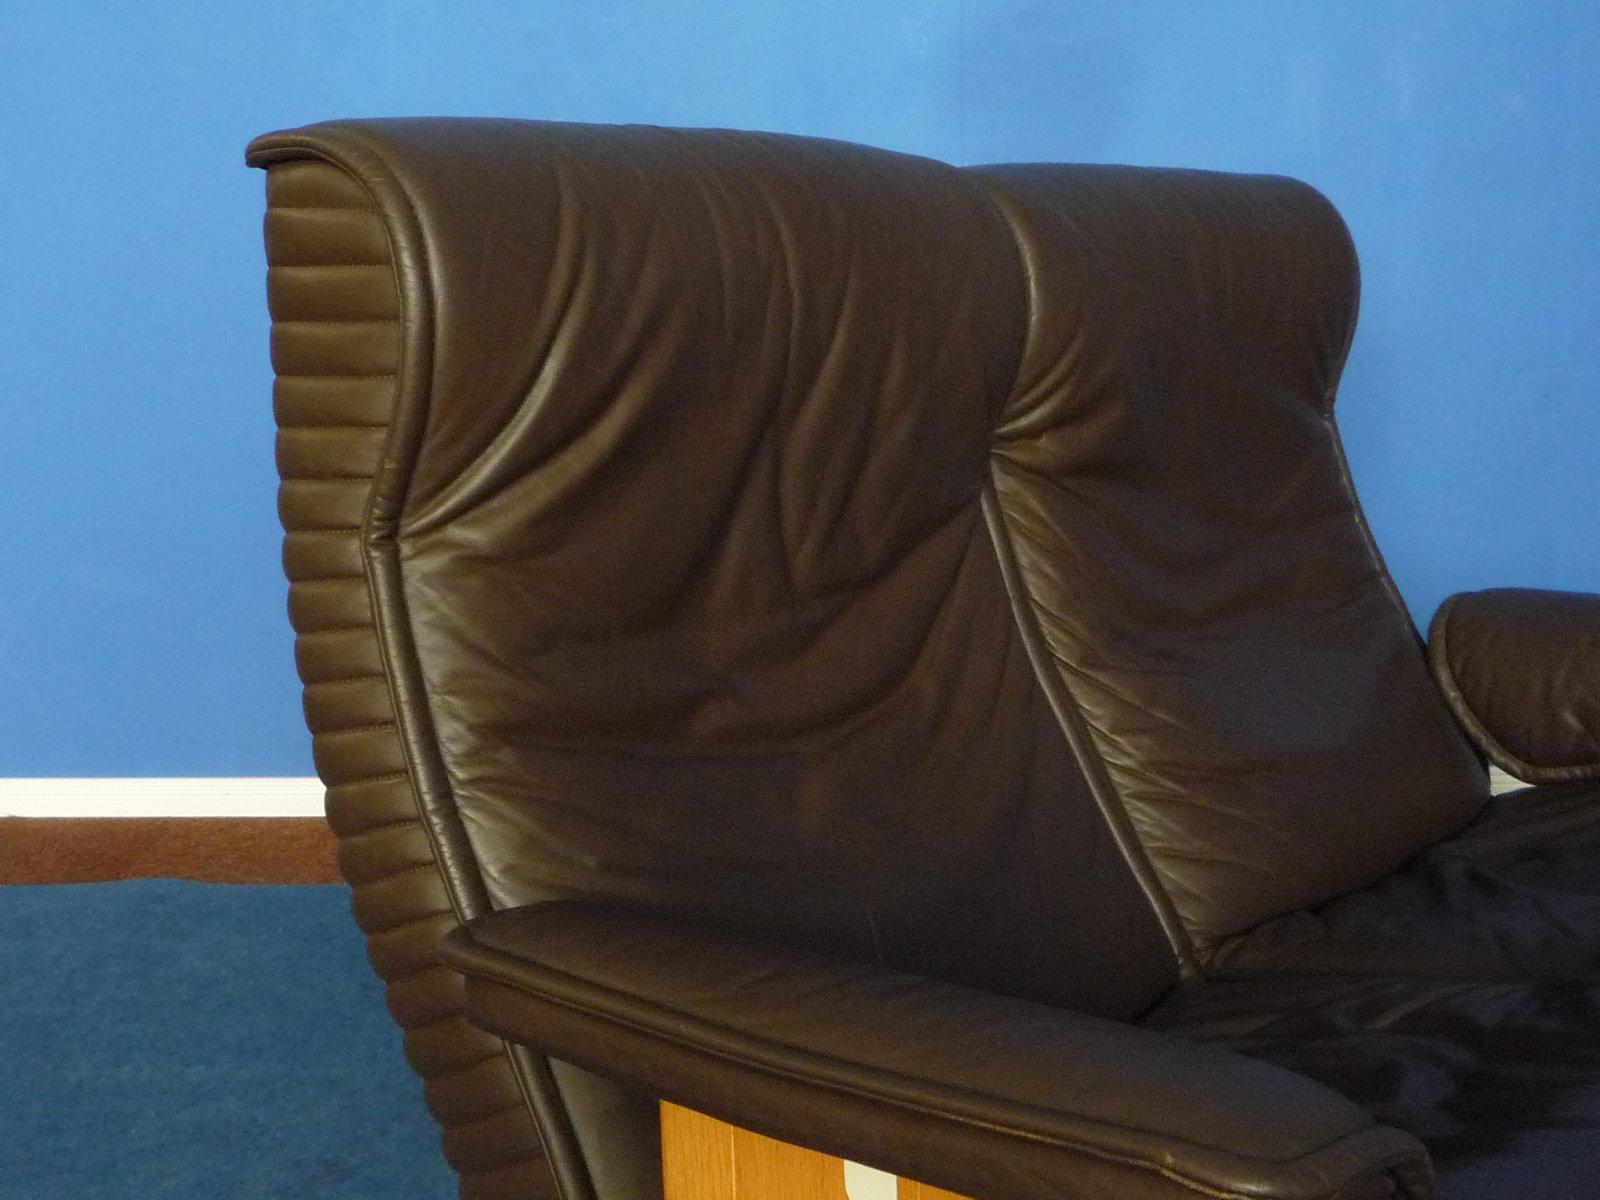 follow me leder sofa von otto zapf f r knoll international 1970er bei pamono kaufen. Black Bedroom Furniture Sets. Home Design Ideas